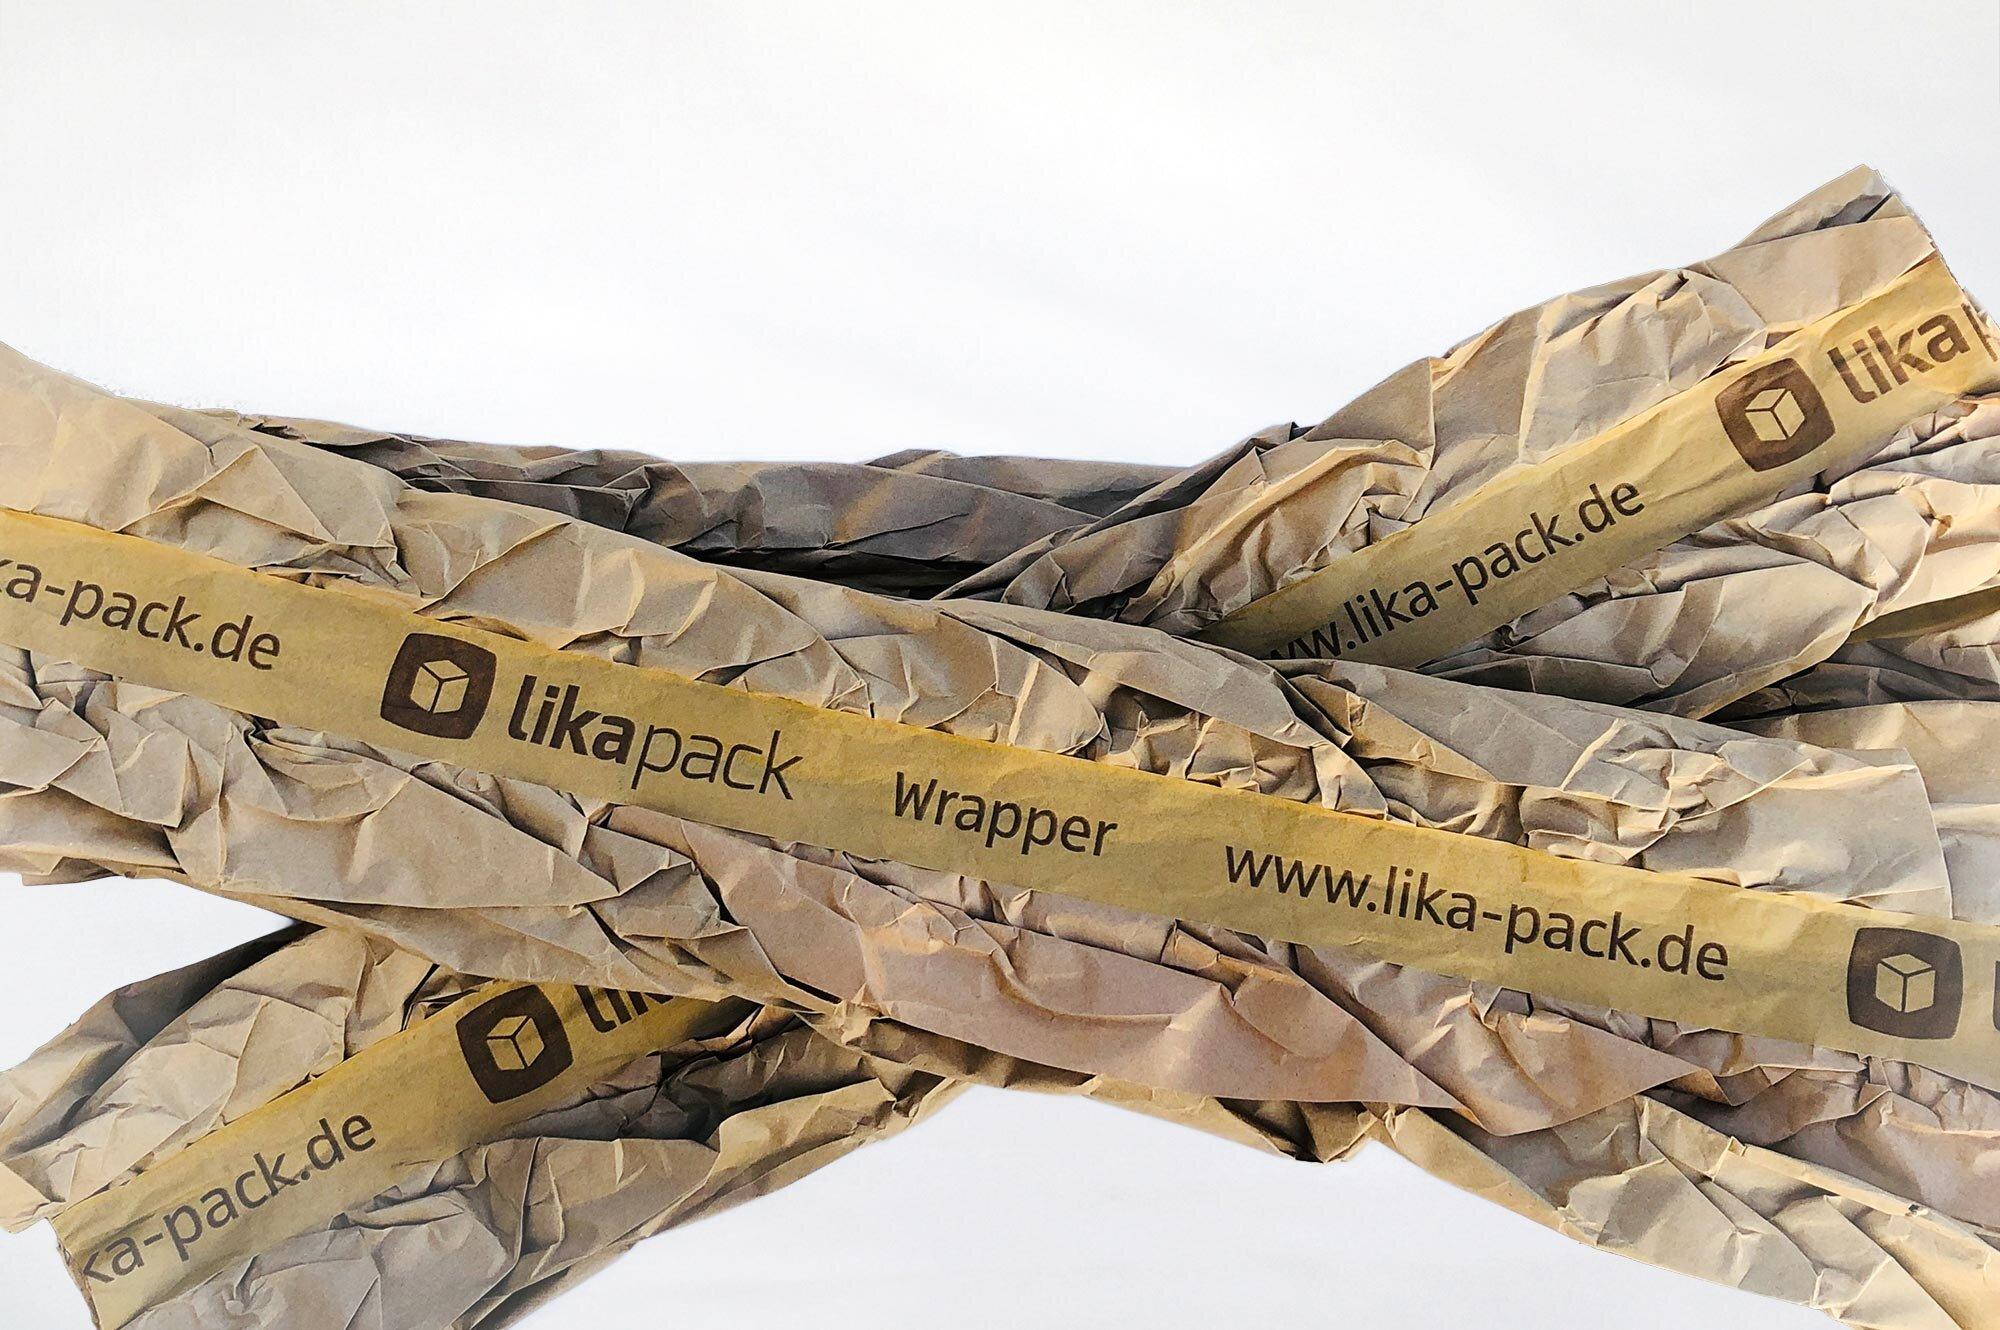 LiKa-Wrapper.jpg